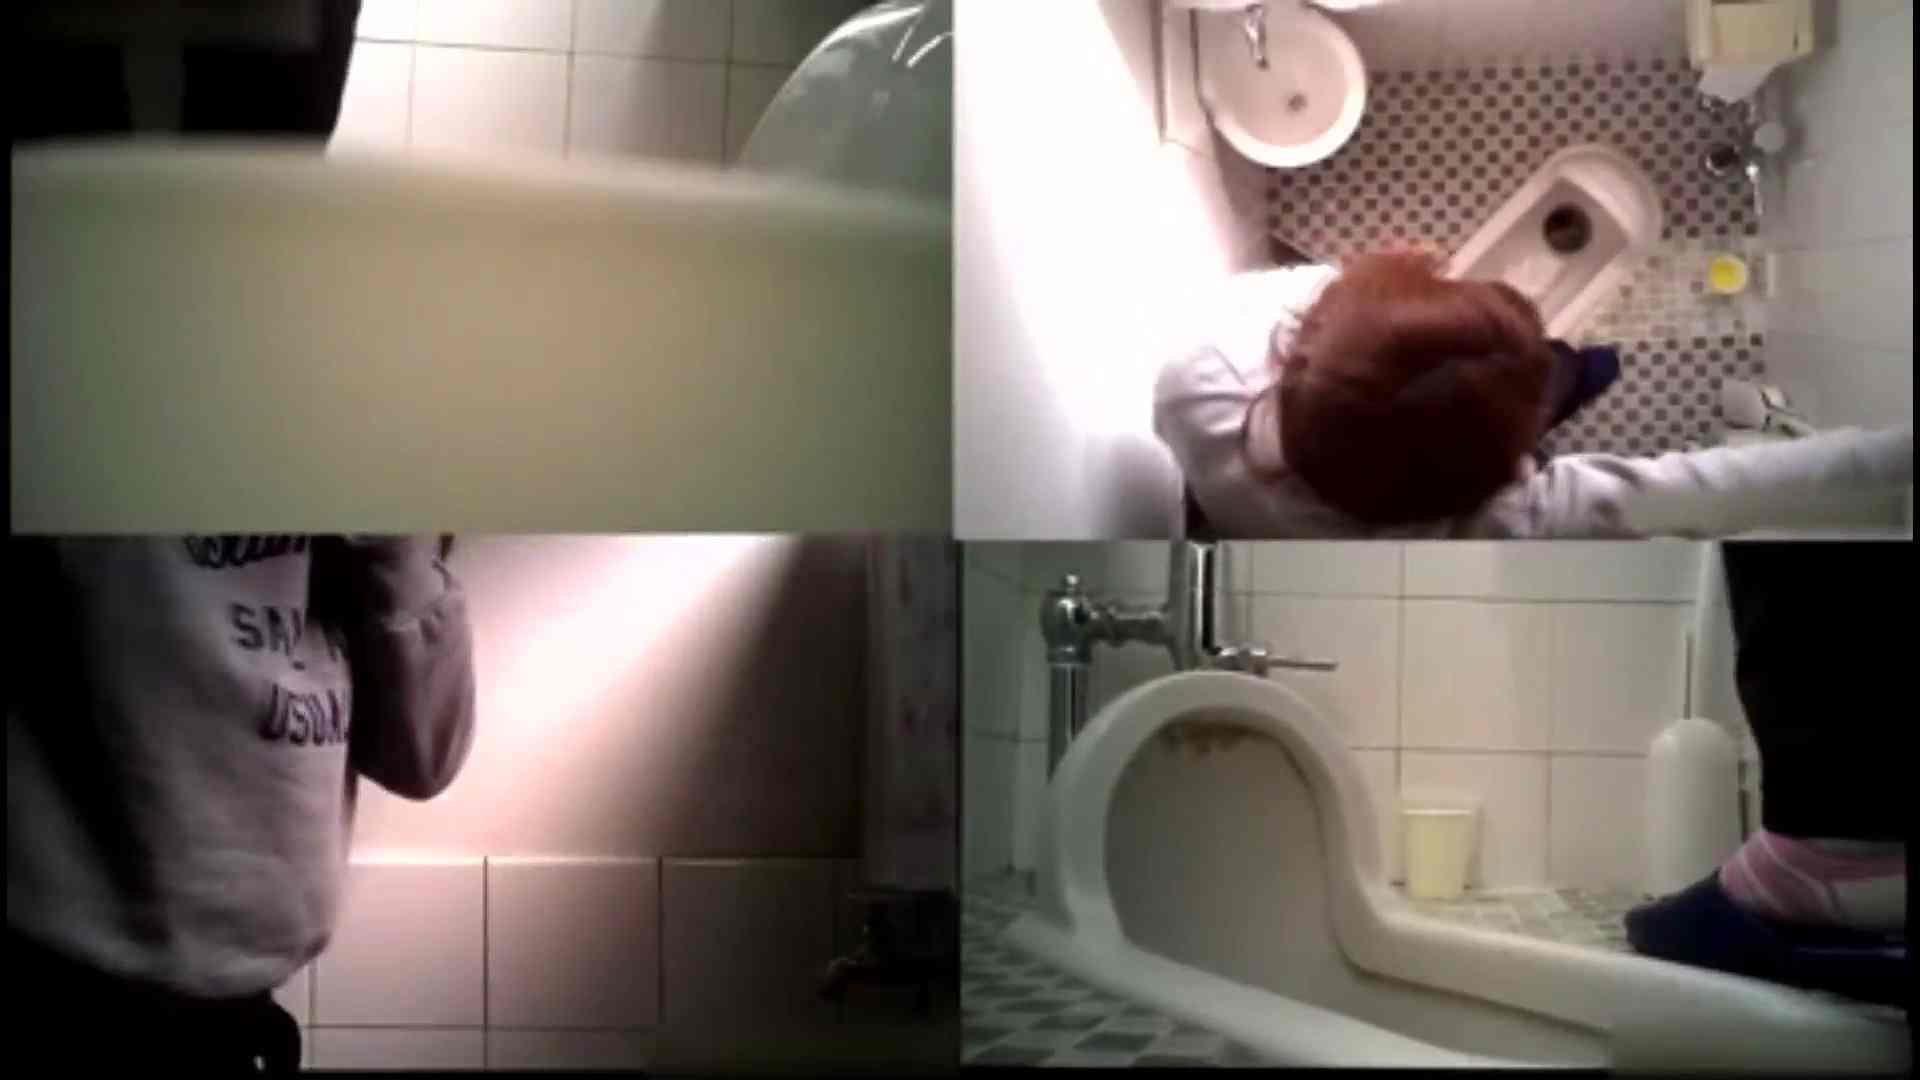 Vol.05 花の女子大生 トイレ恥態 進化系マルチアングル!! 女子大生  80pic 22